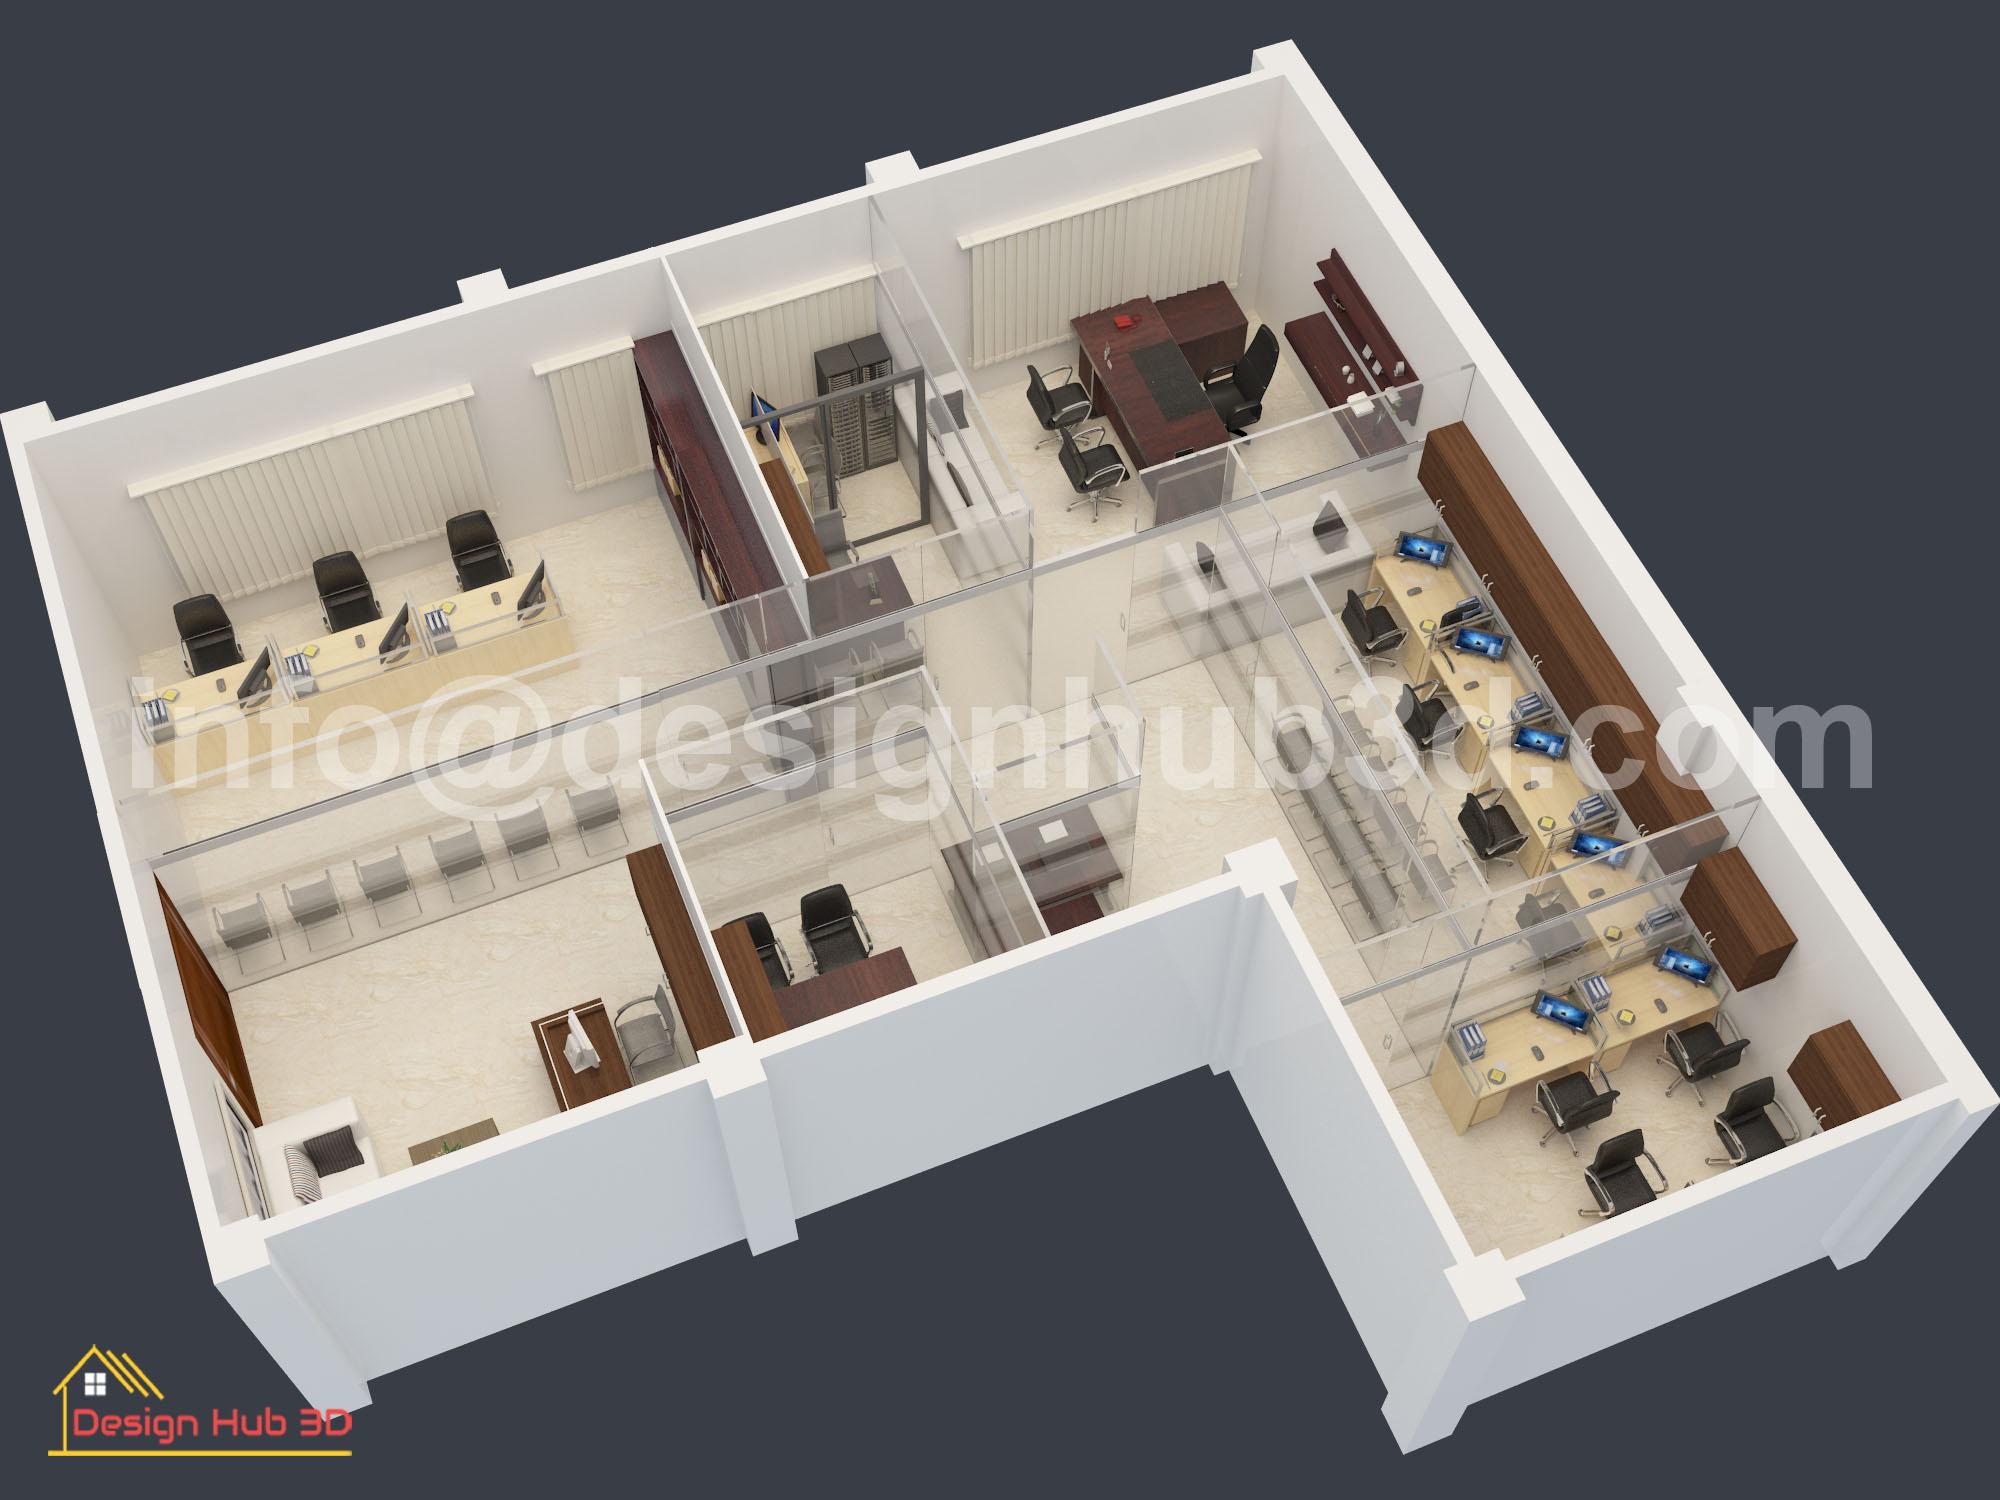 Office Designhub 3d